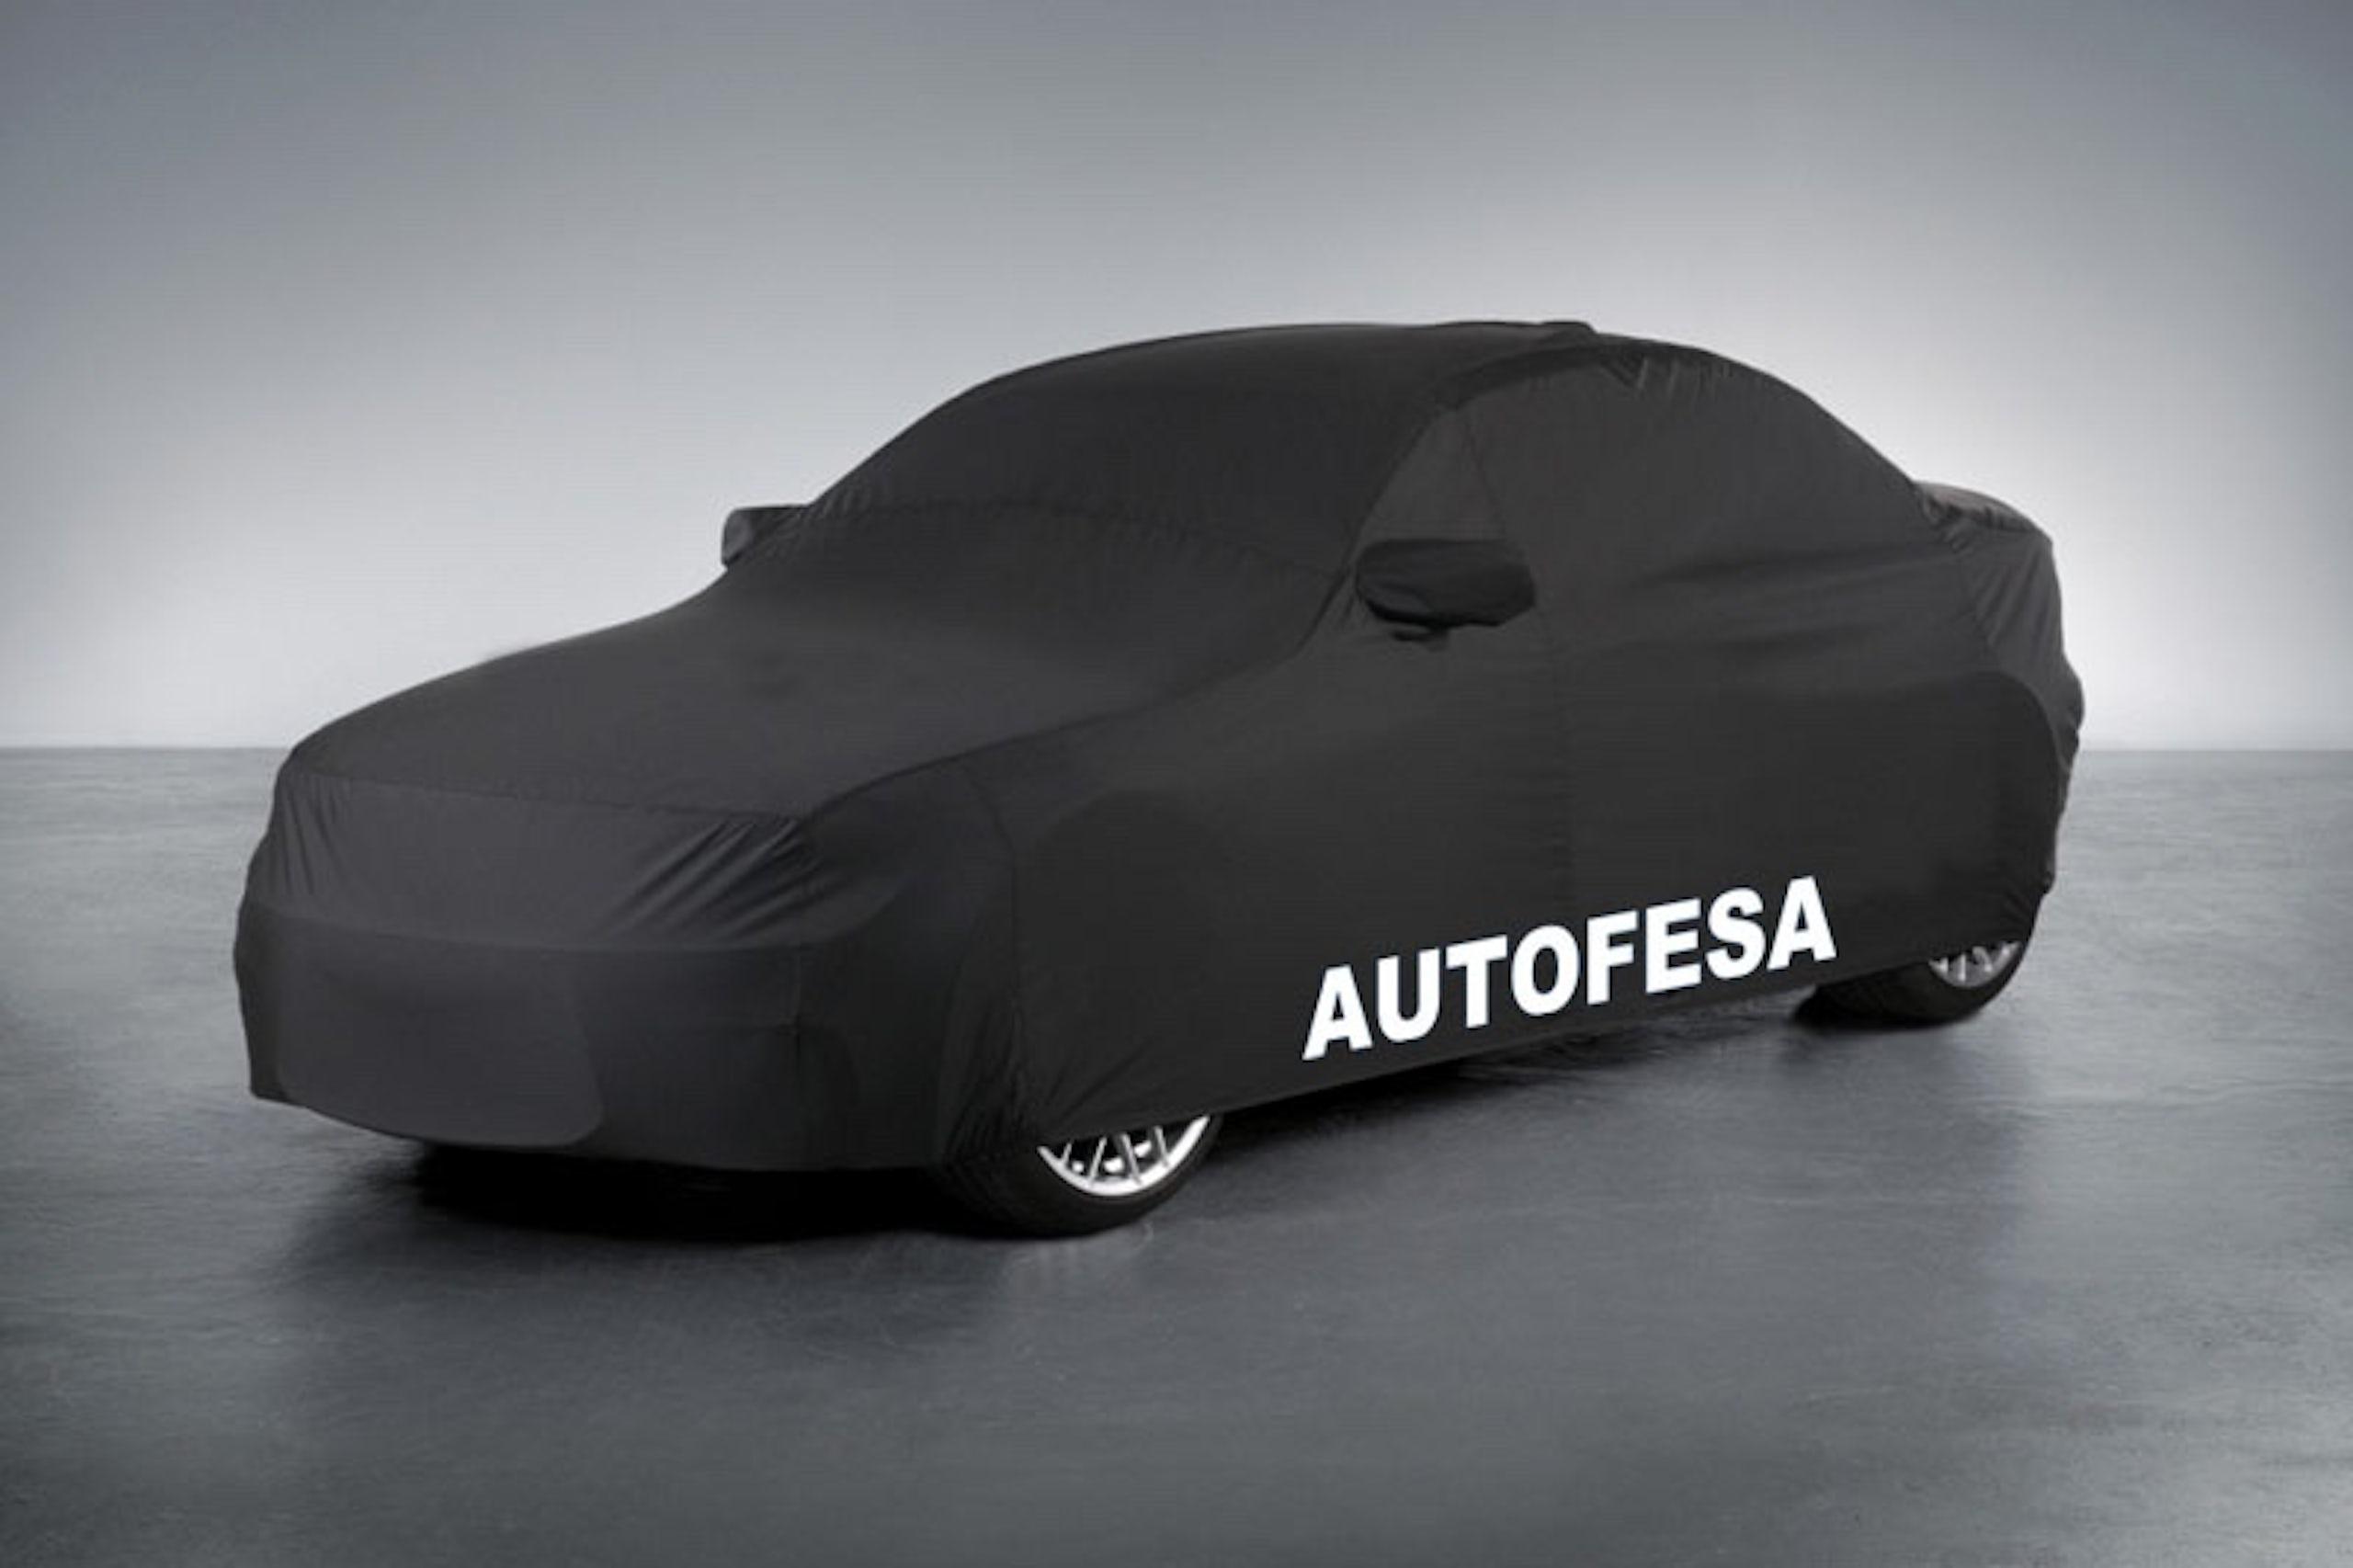 Audi A6 A6Avant COMPETITION ABT 3.0 TDI V6 T 326cv quattro 5p S tronic 4x4 Cpmpetition ABT S/S - Foto 21